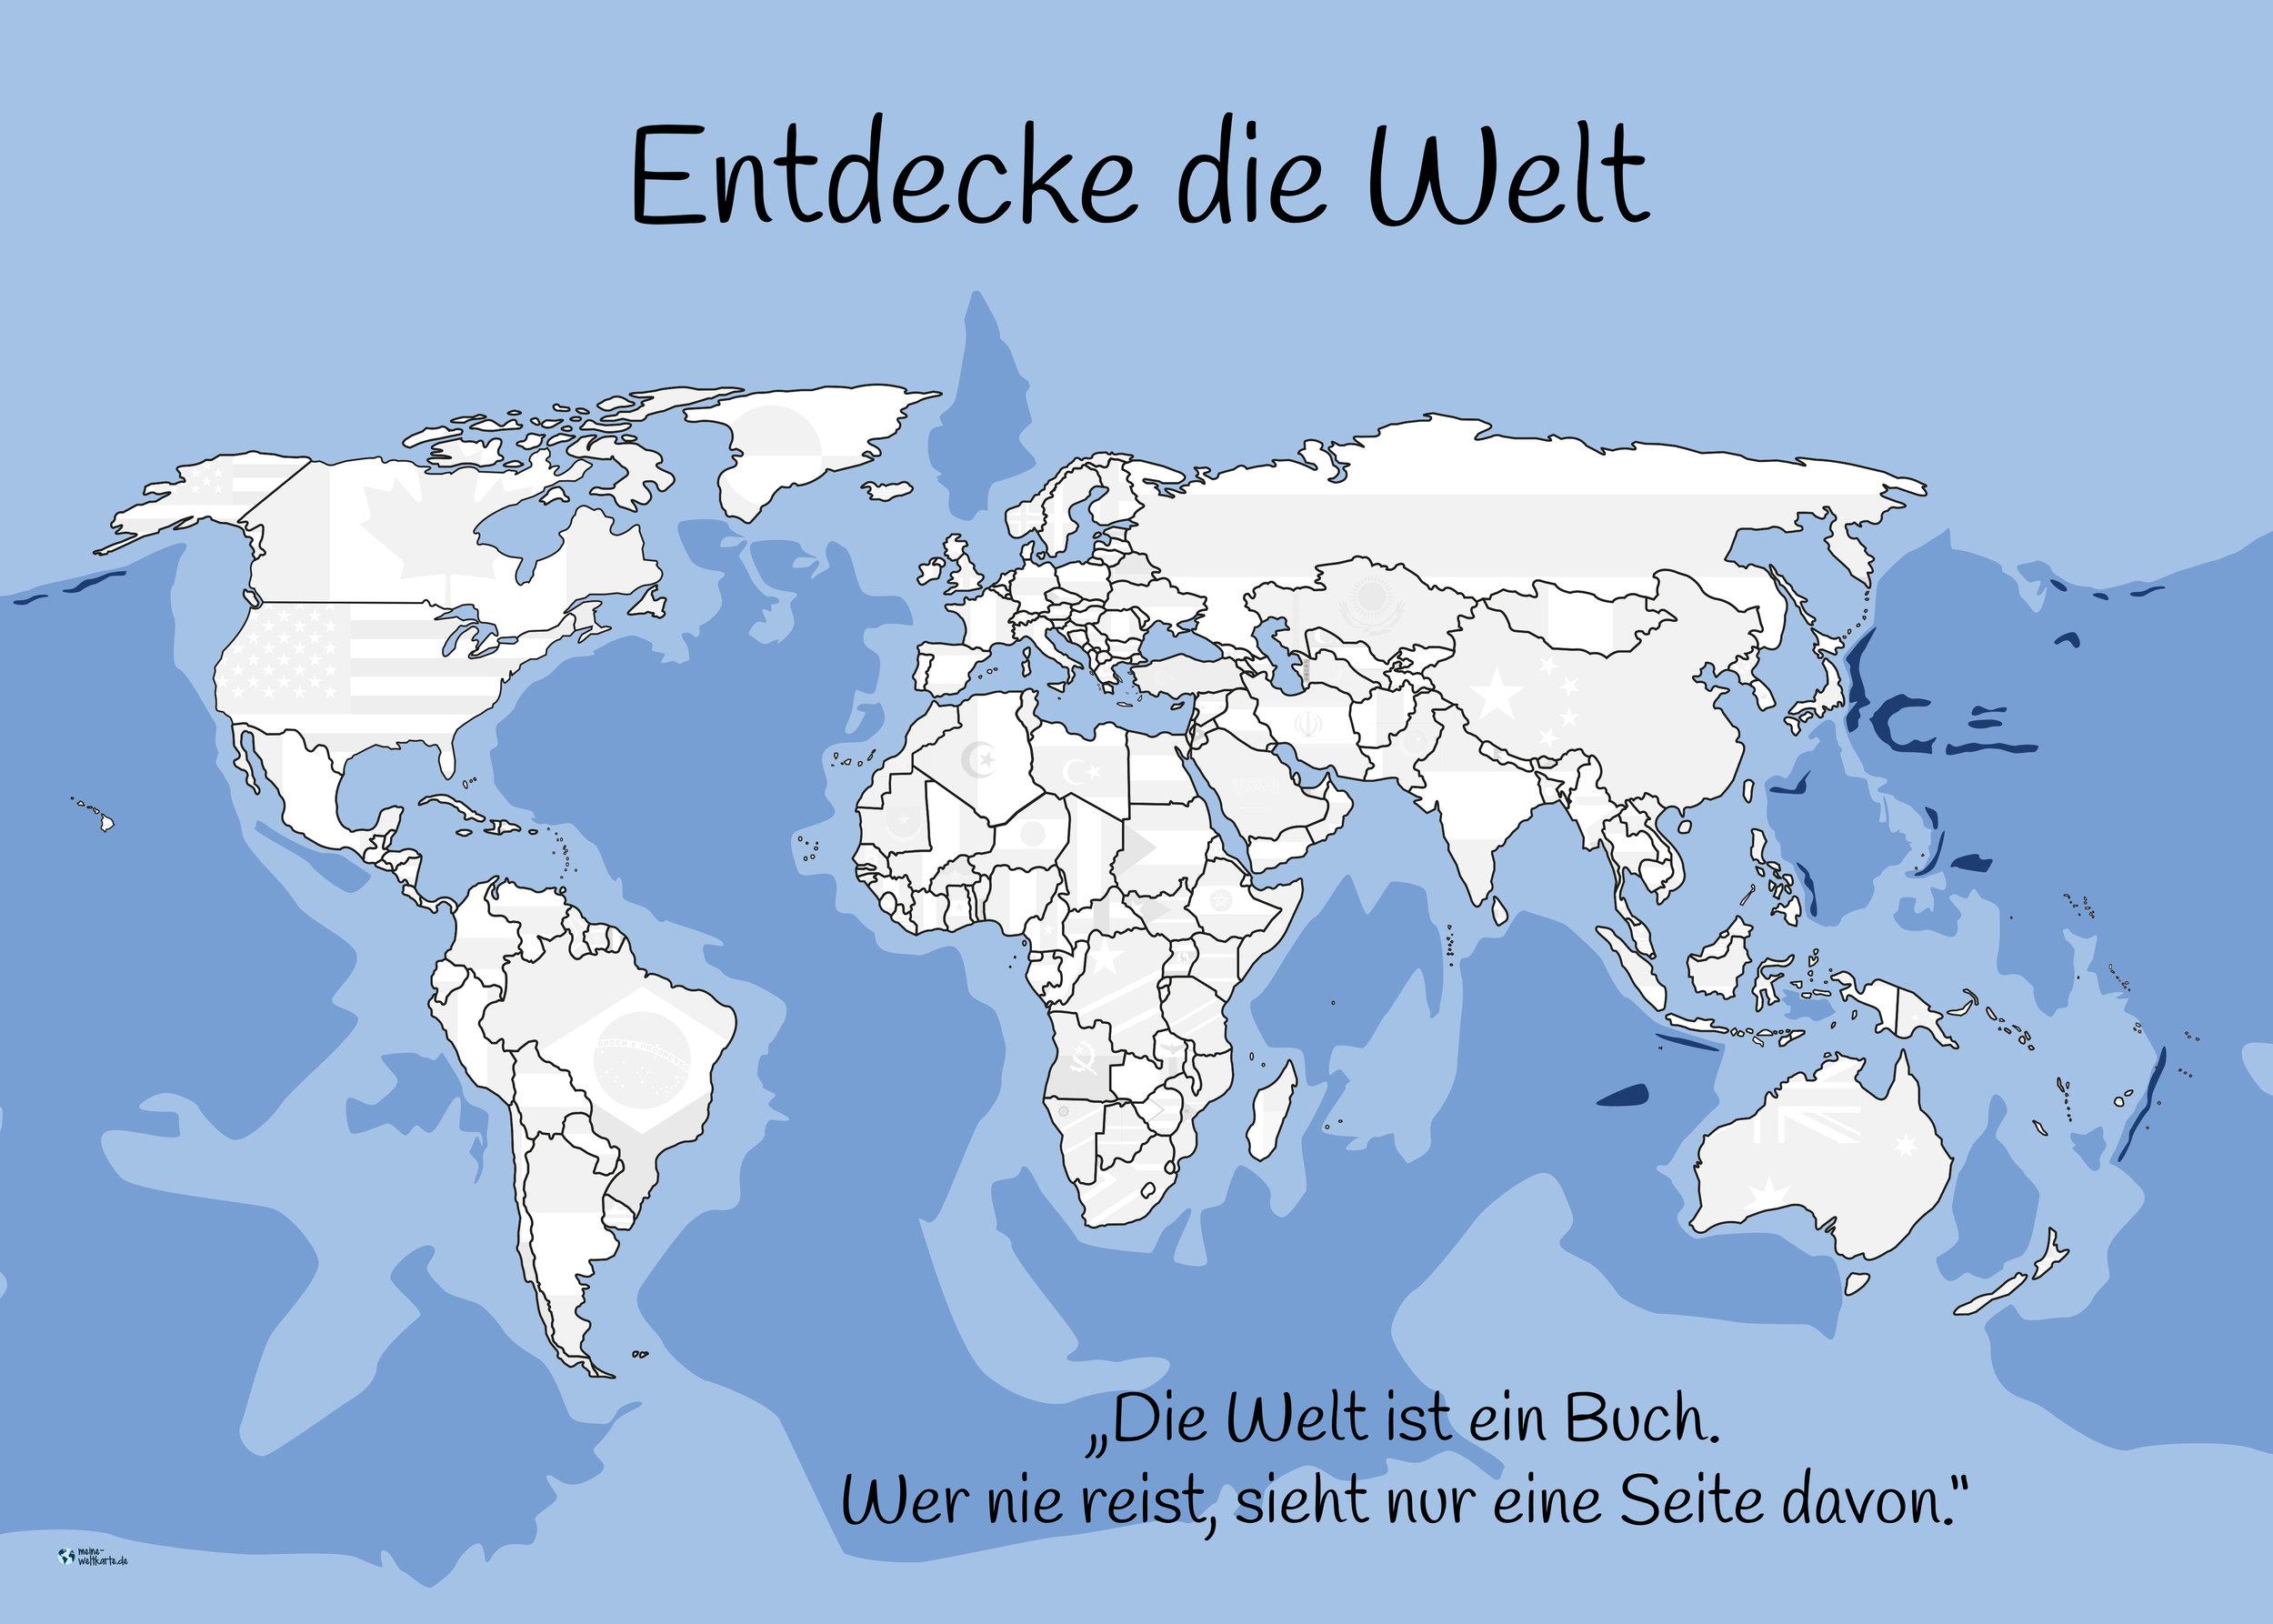 BurdaAktion_4_70x50_Weltkarte_KR.jpg